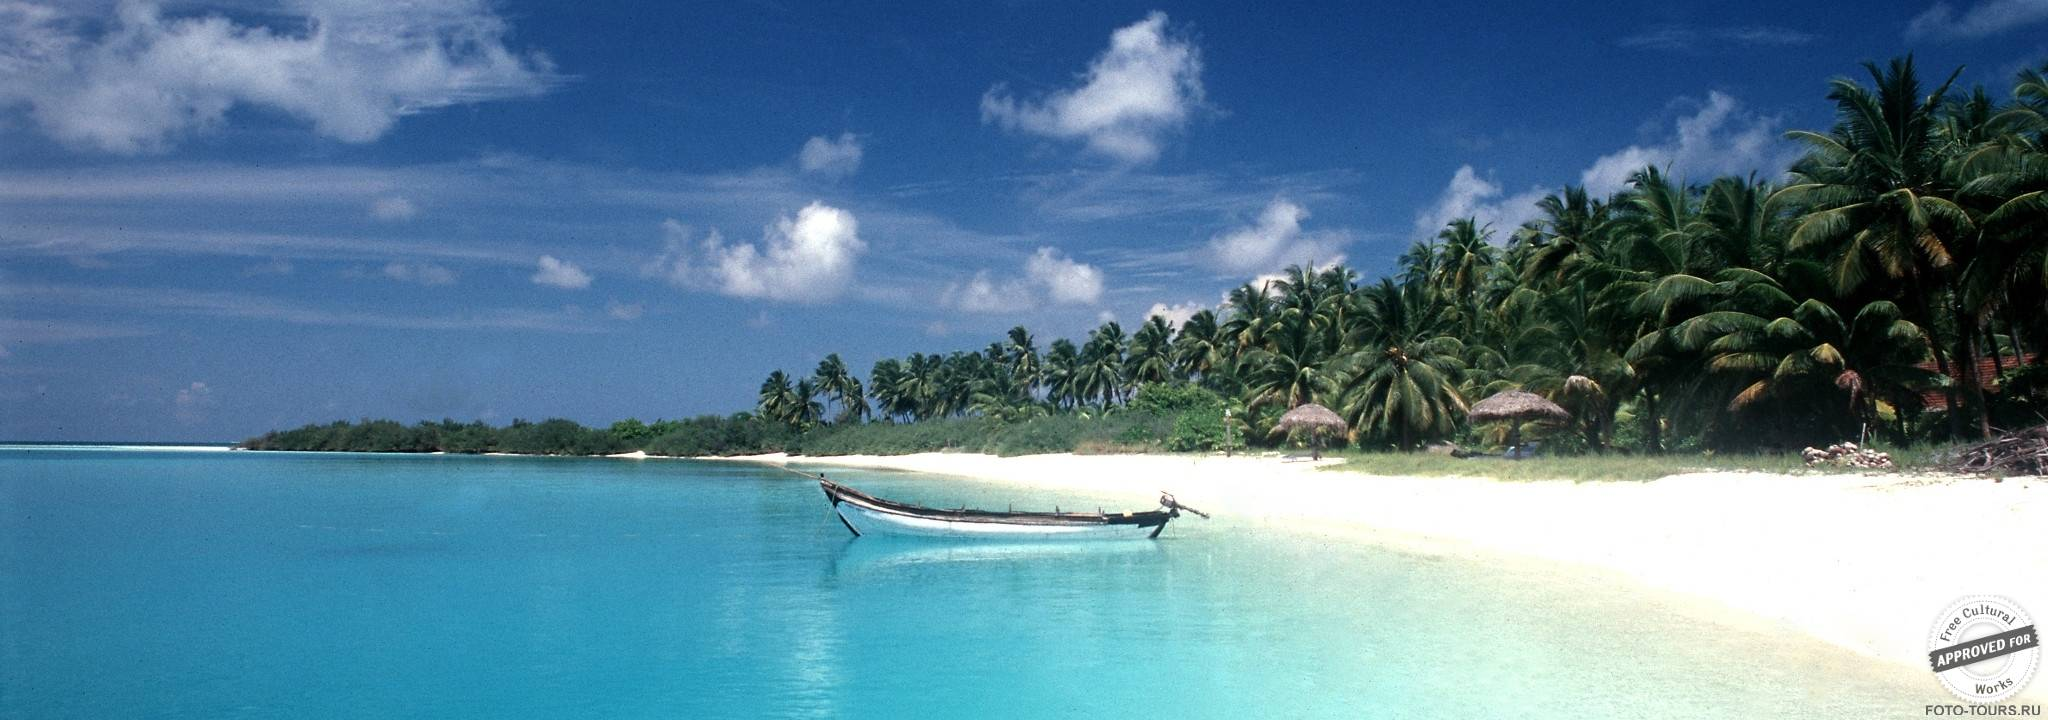 Гоа - рай на земле